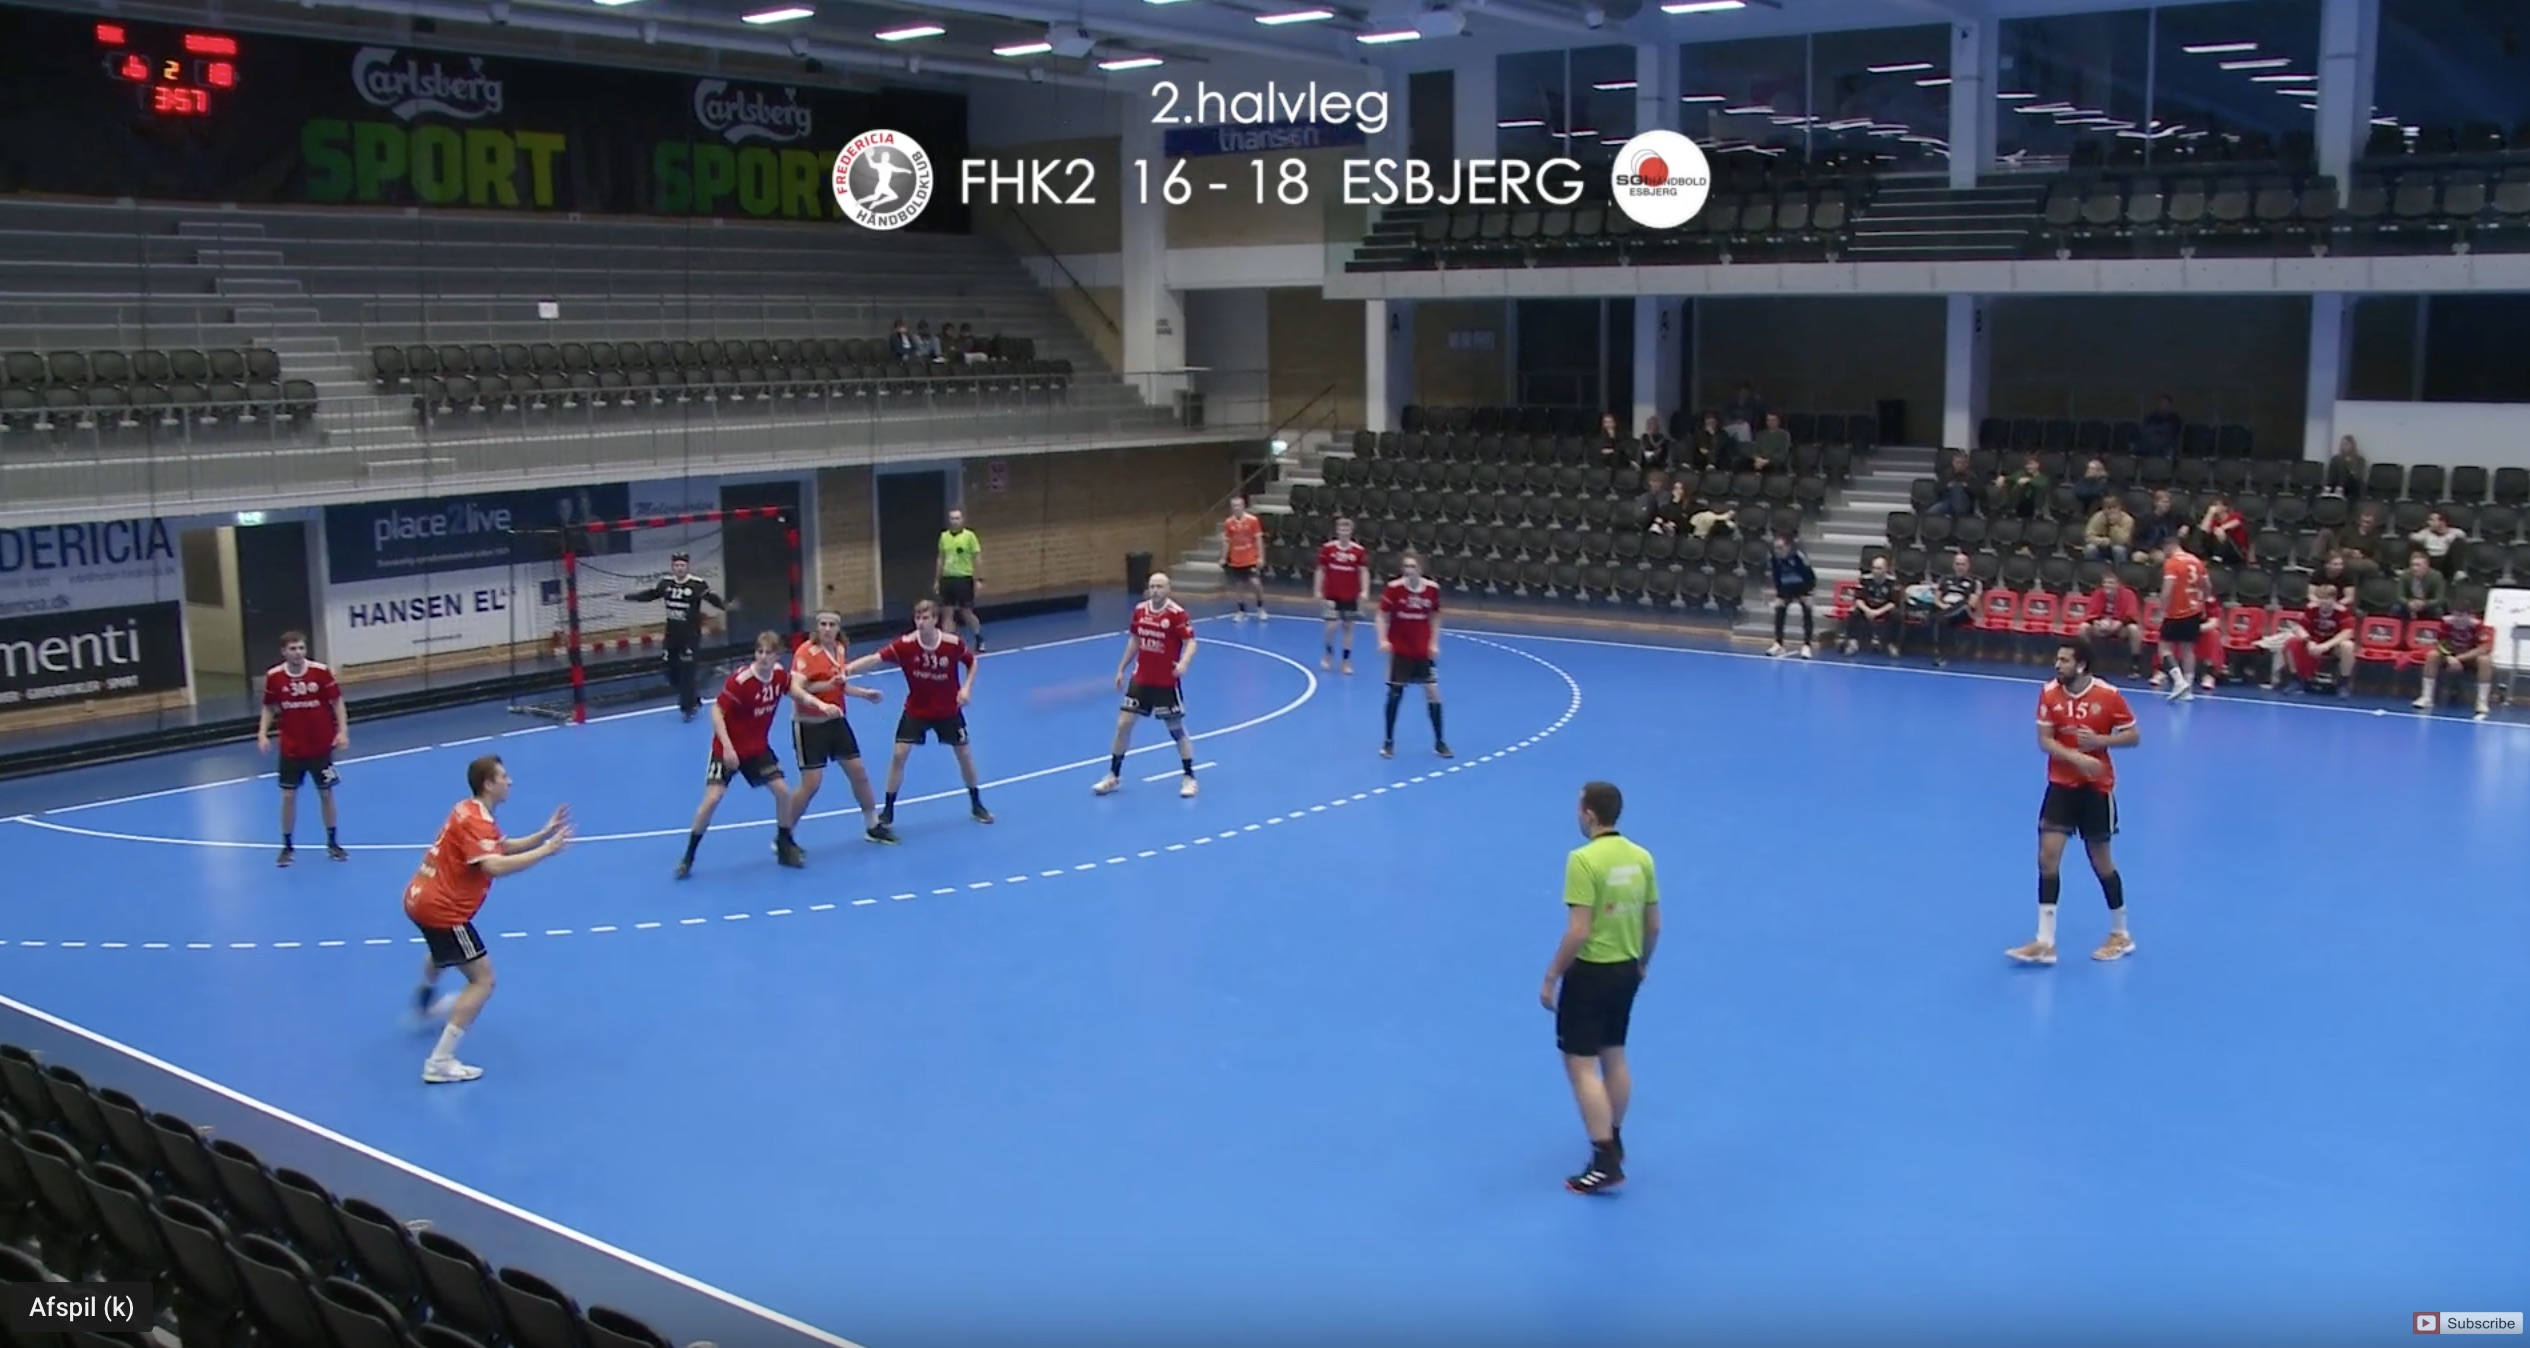 Se håndboldkamp: FHK2 V.s. Esbjerg